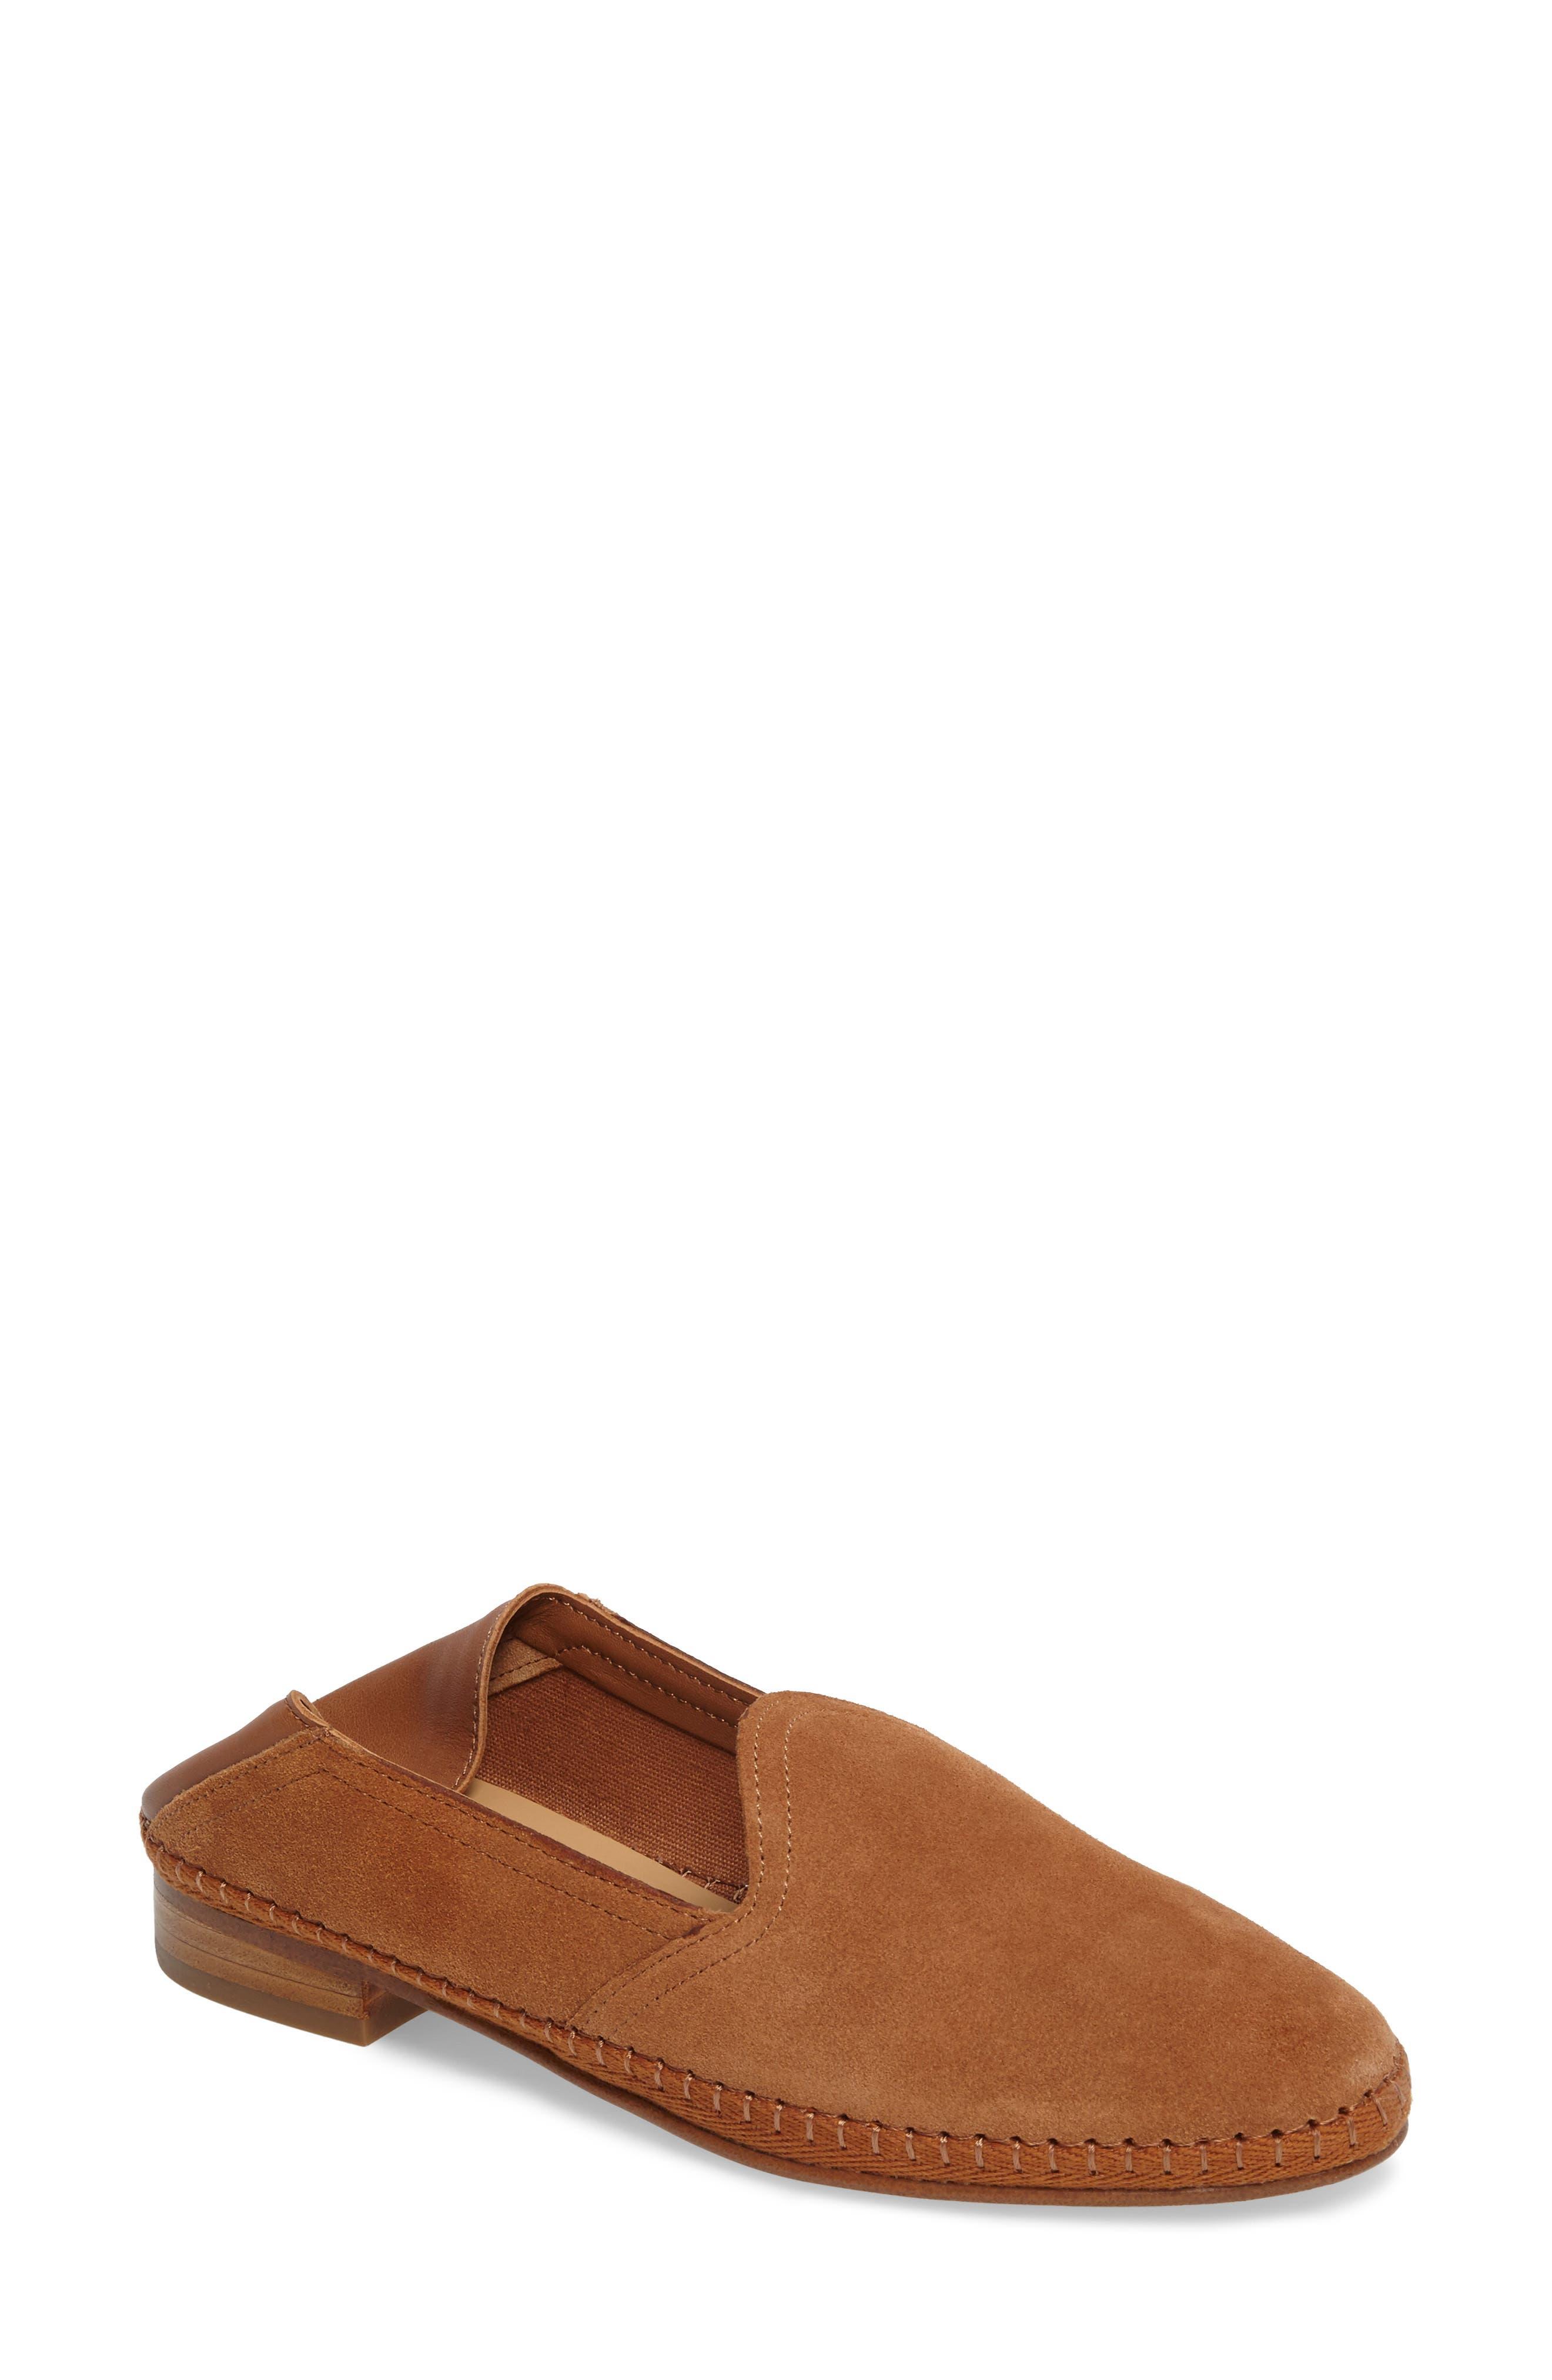 Soludus Convertible Venetian Loafer (Women)